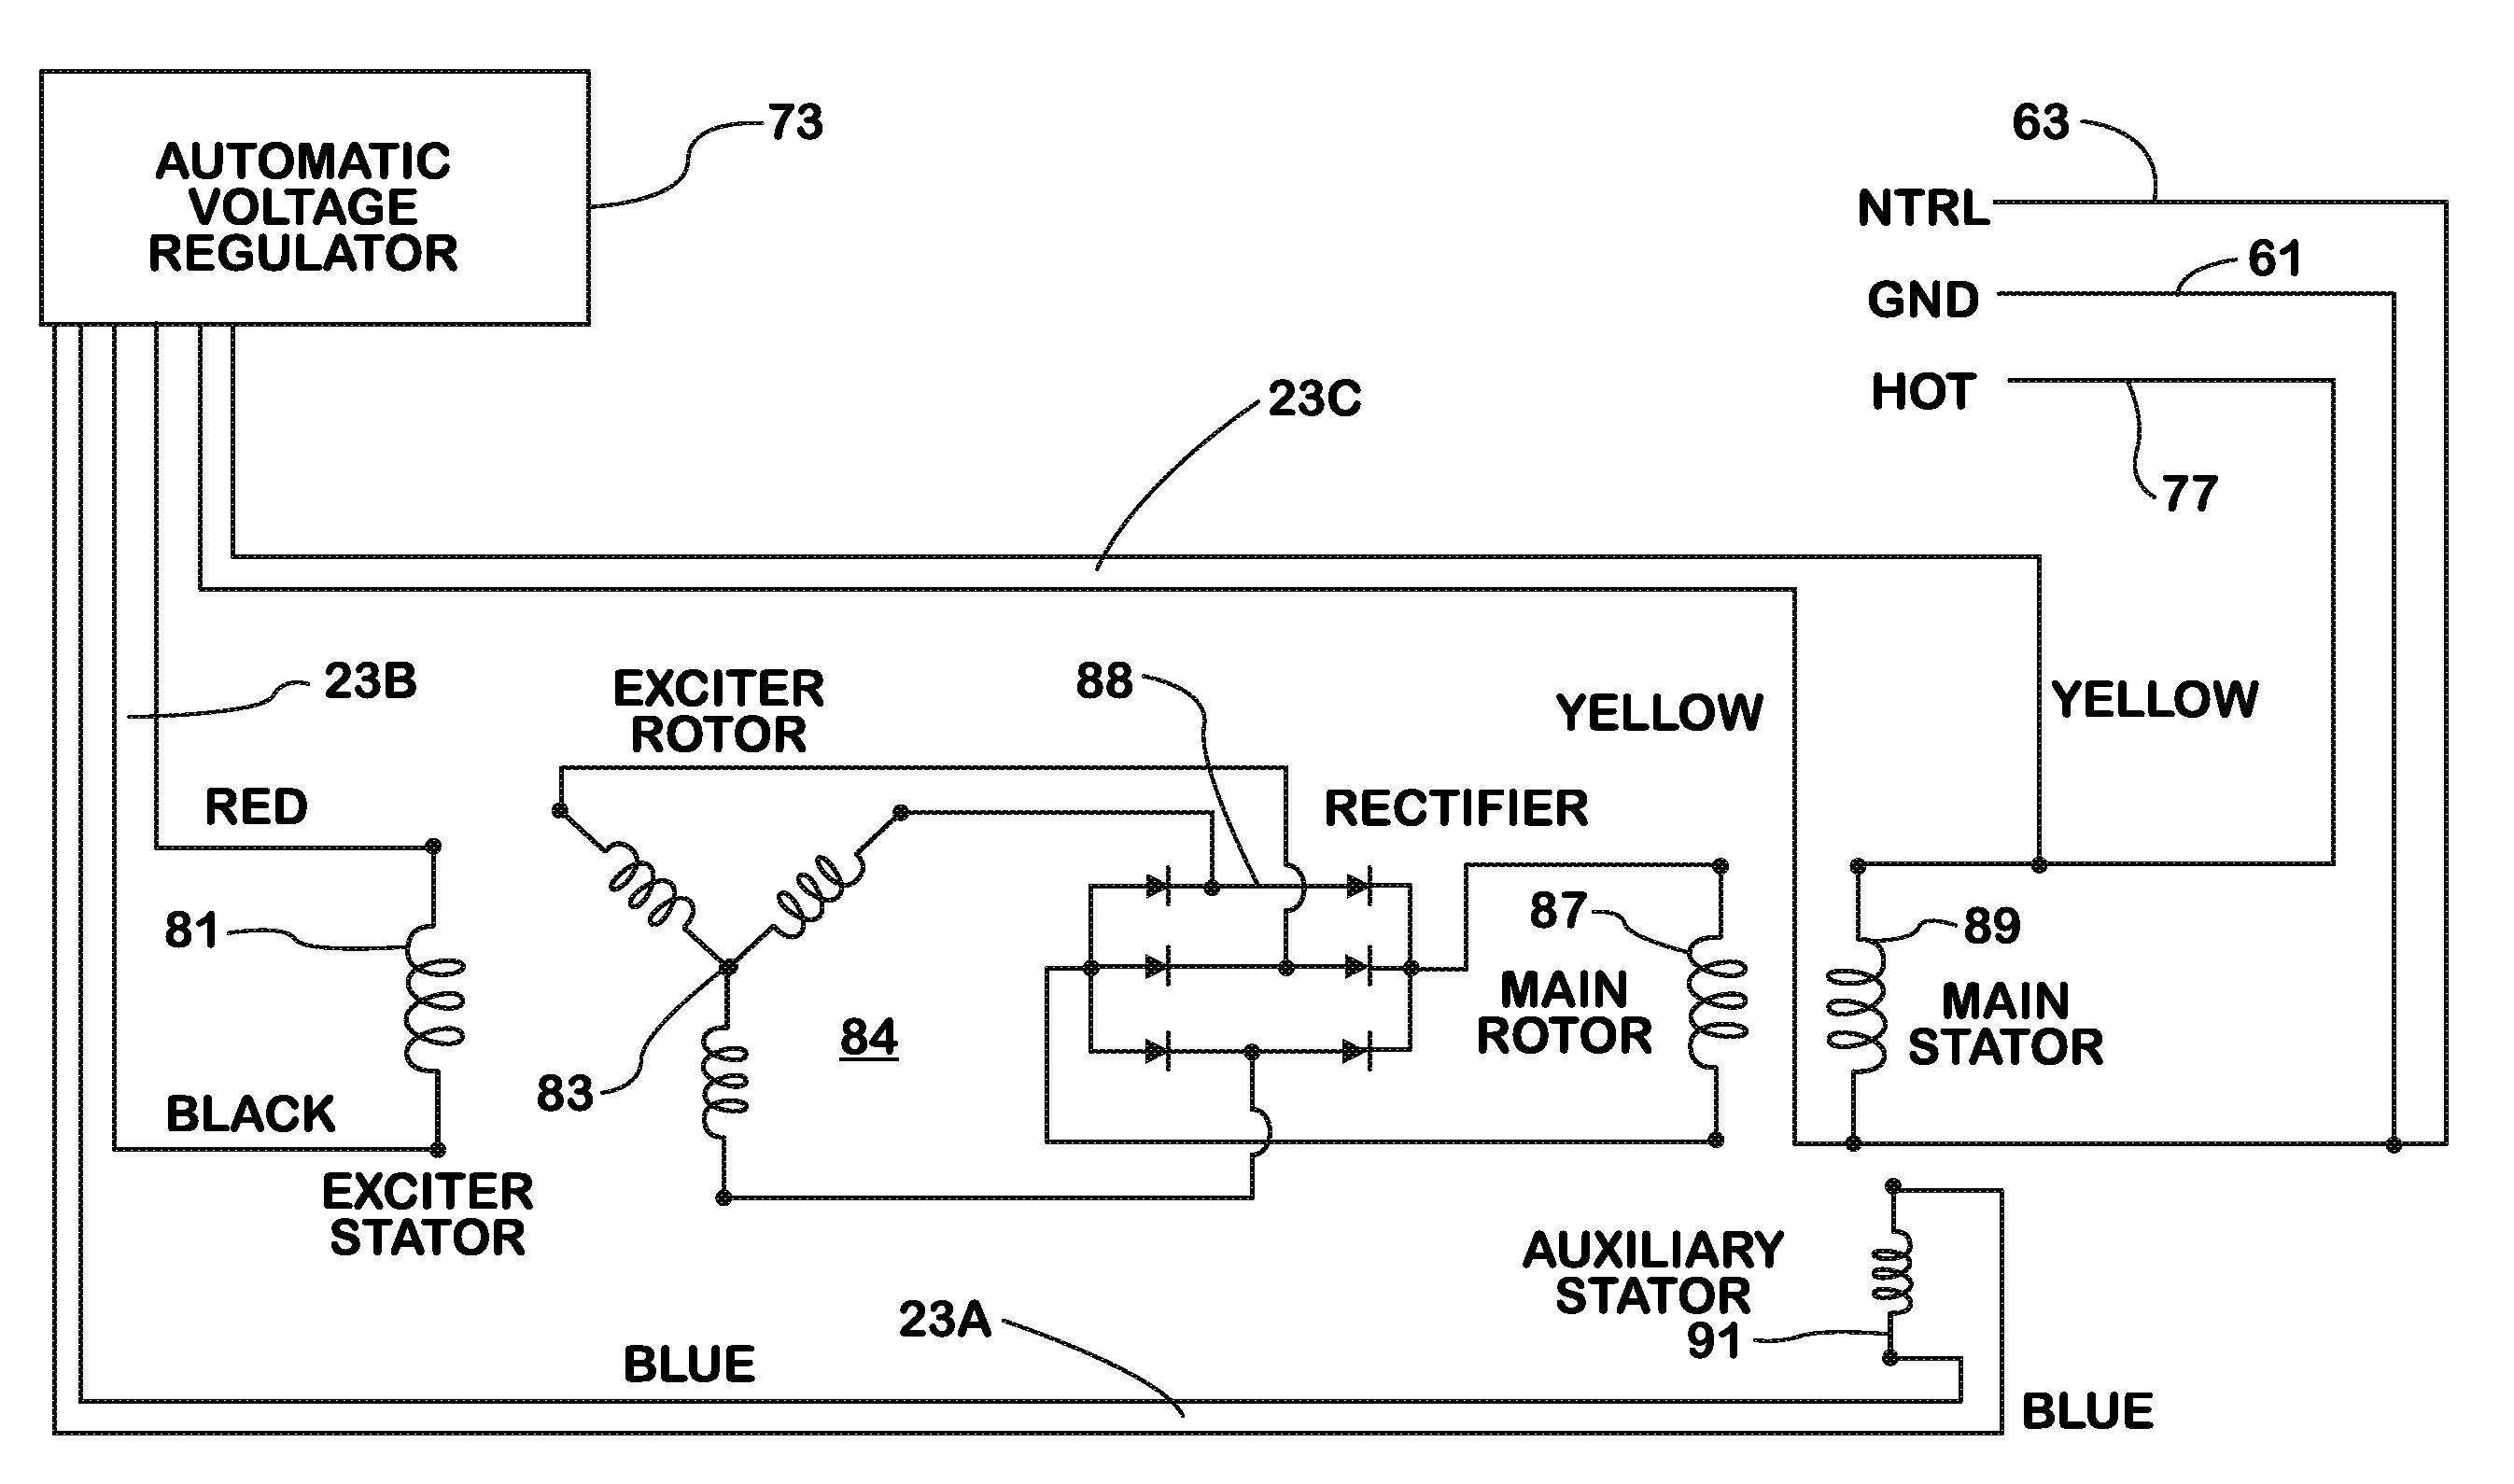 Alternator Parts Diagram Automotive Voltage Regulator Wiring Diagram Download Of Alternator Parts Diagram Alternator Wiring Diagram Image